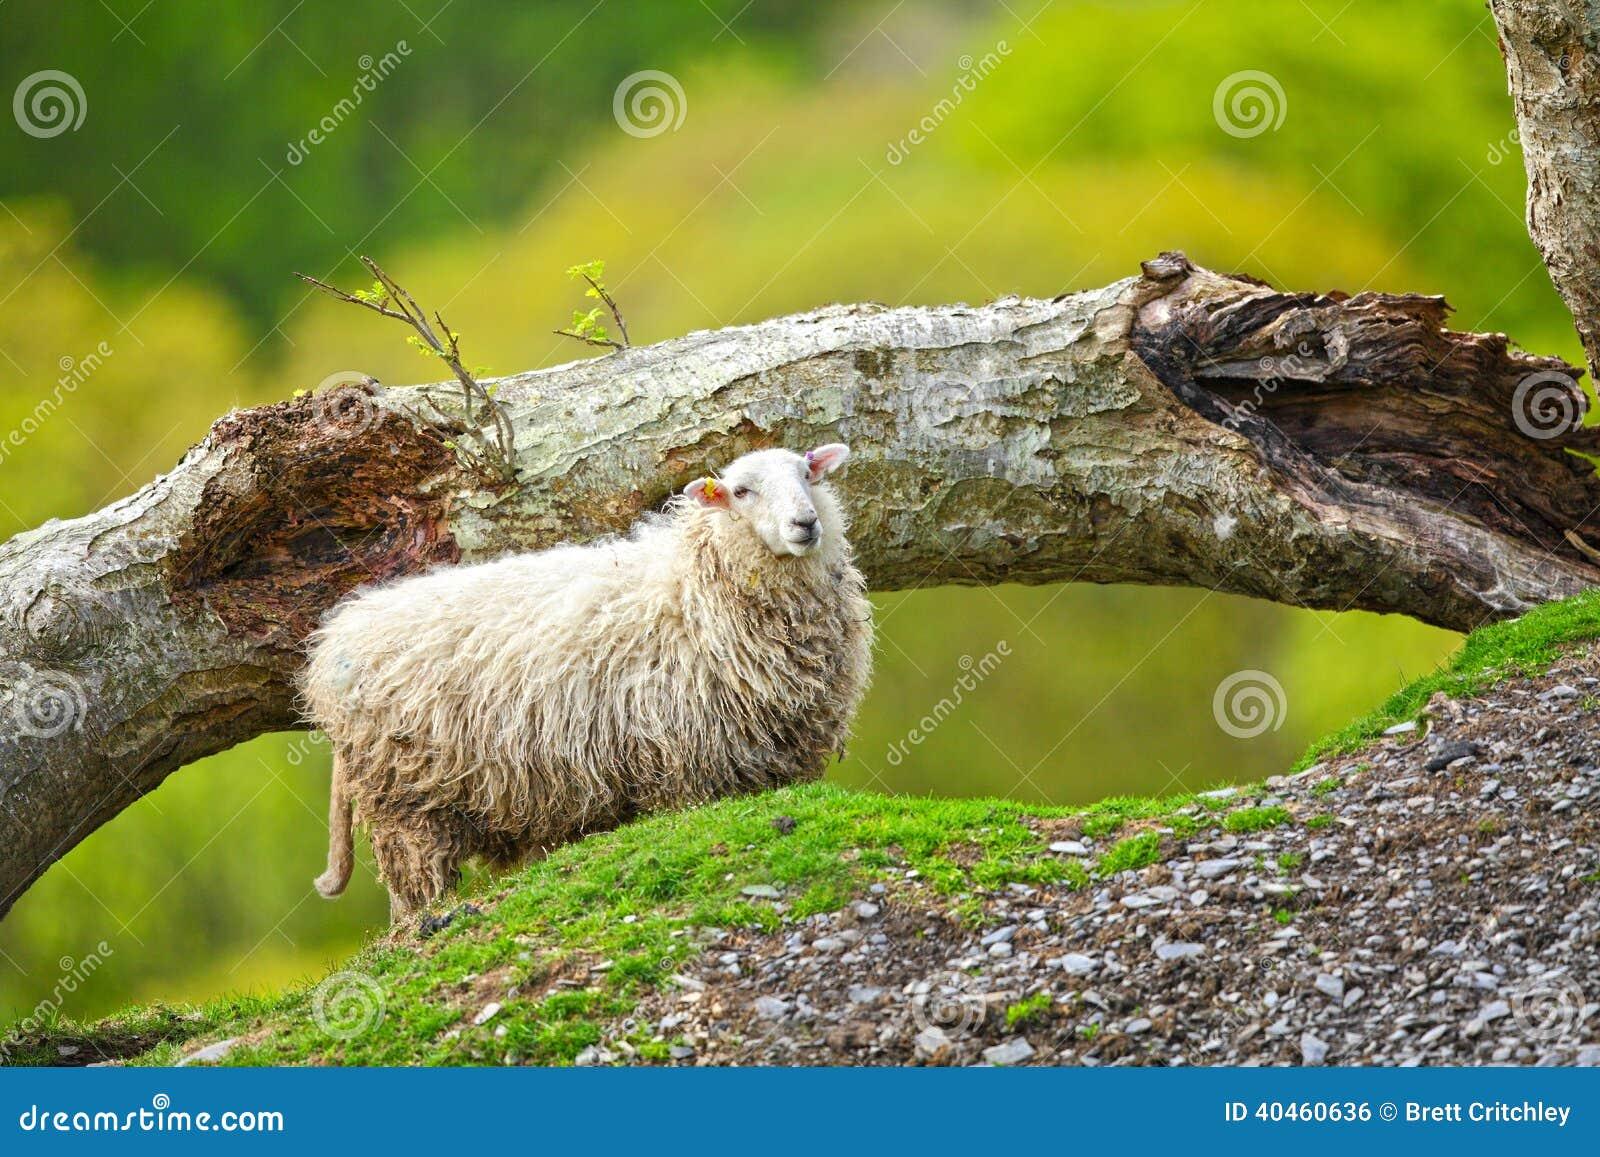 Sheep ewe